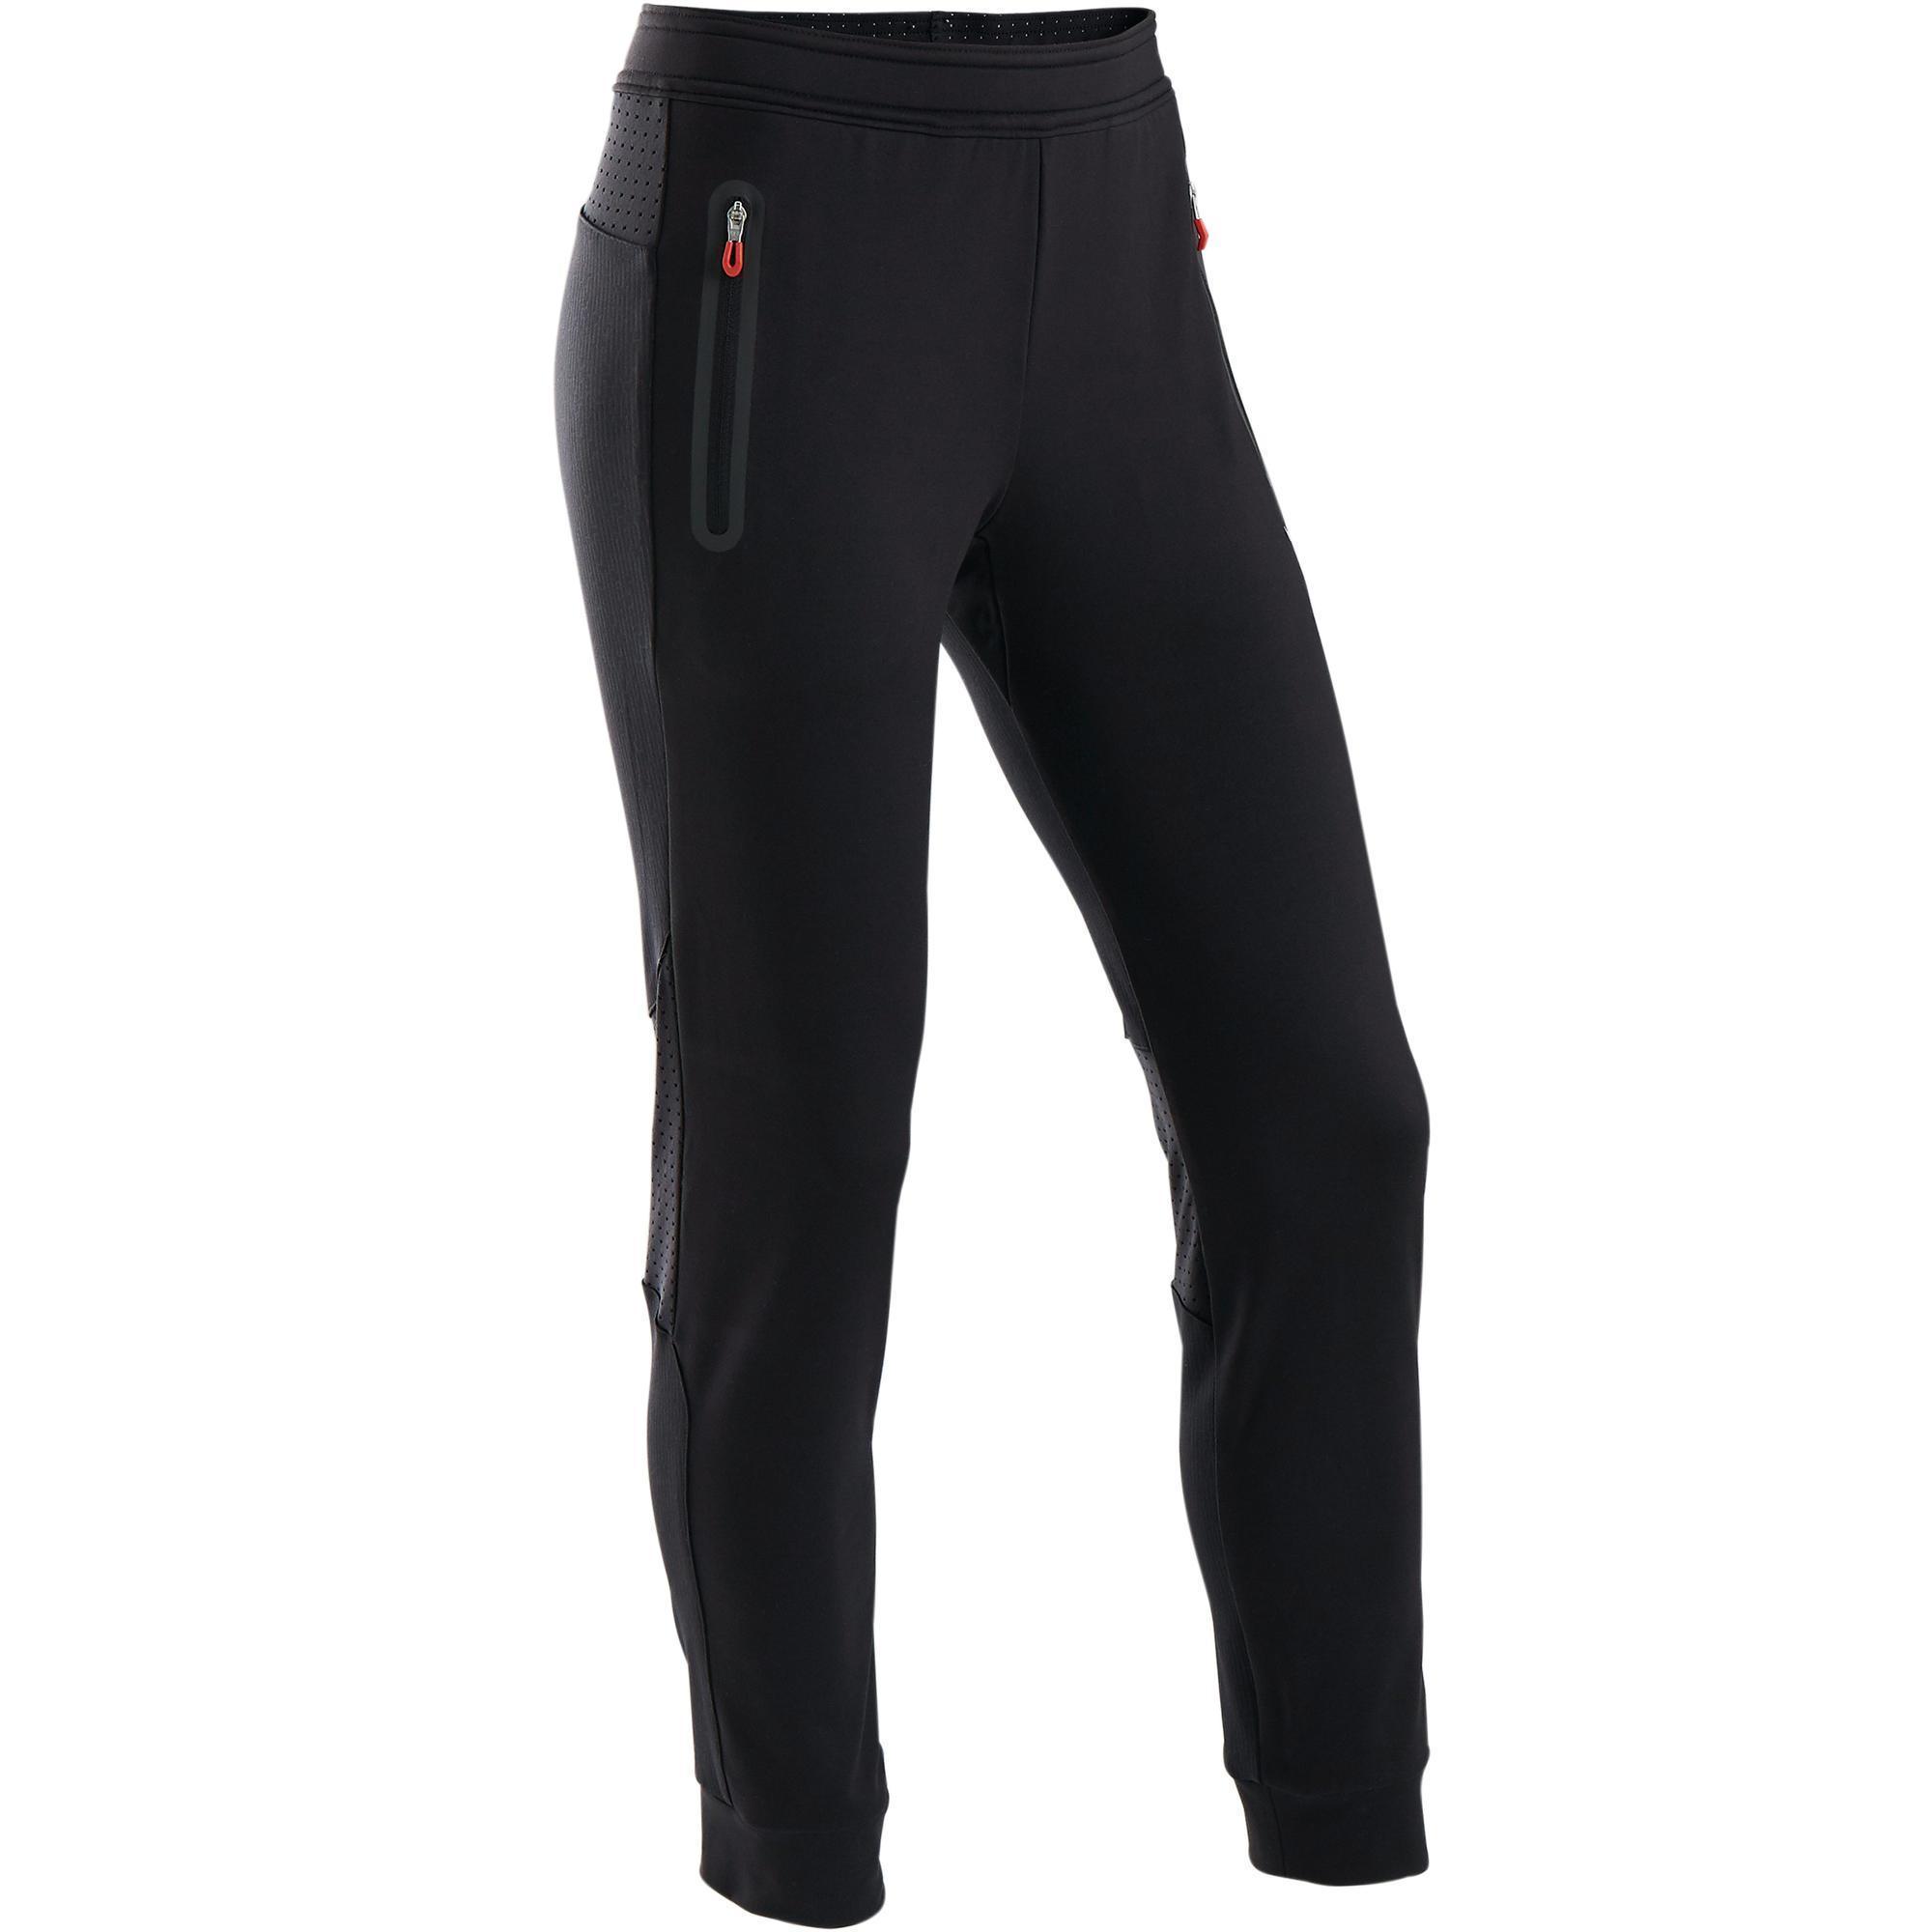 Trainingshose warm Slim S900 atmungsaktiv Gym Kinder schwarz/rot